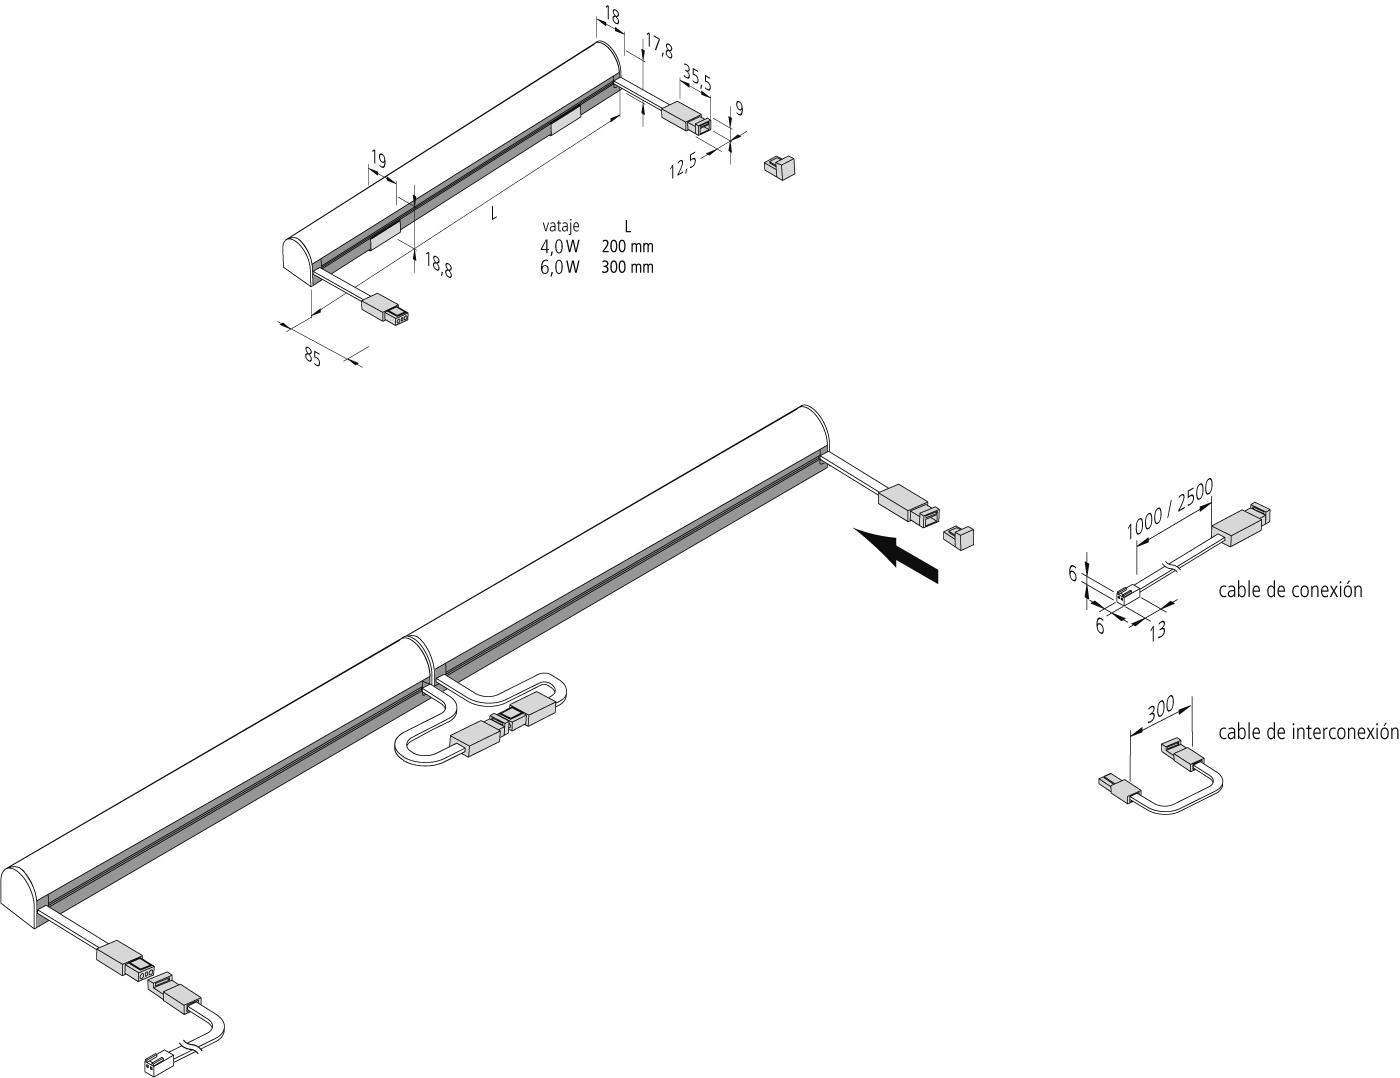 Vista preliminar: LED-Evo-Stick-F_3D_es